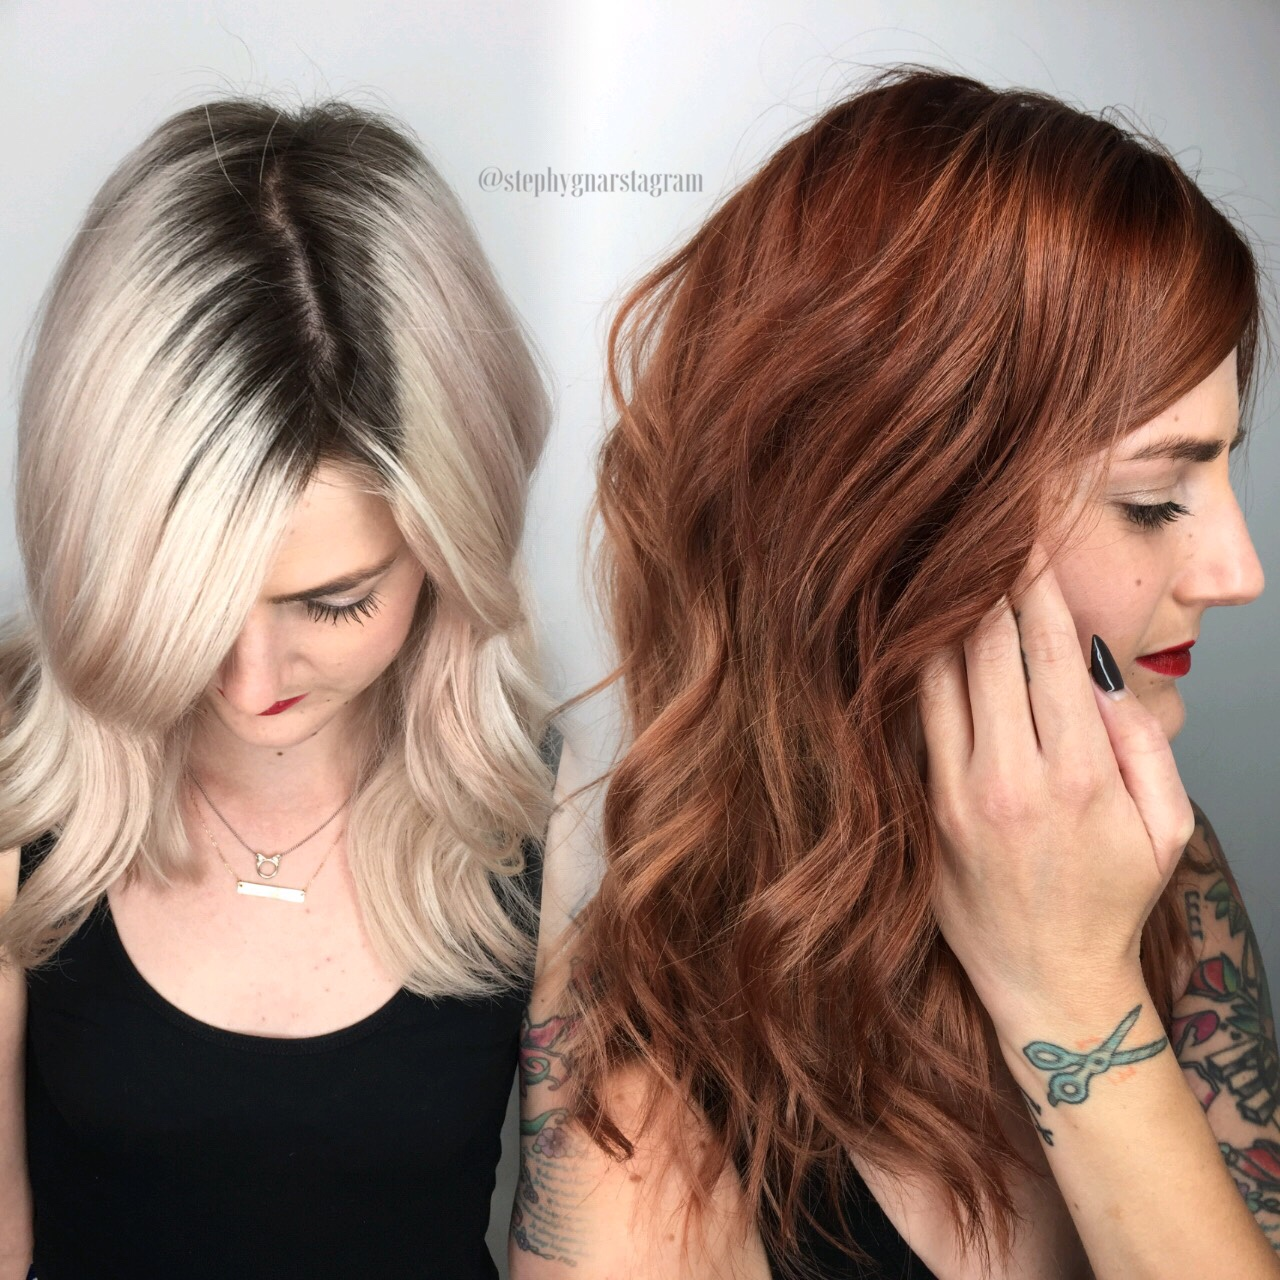 Makeover: Platinum To Dimensional Copper